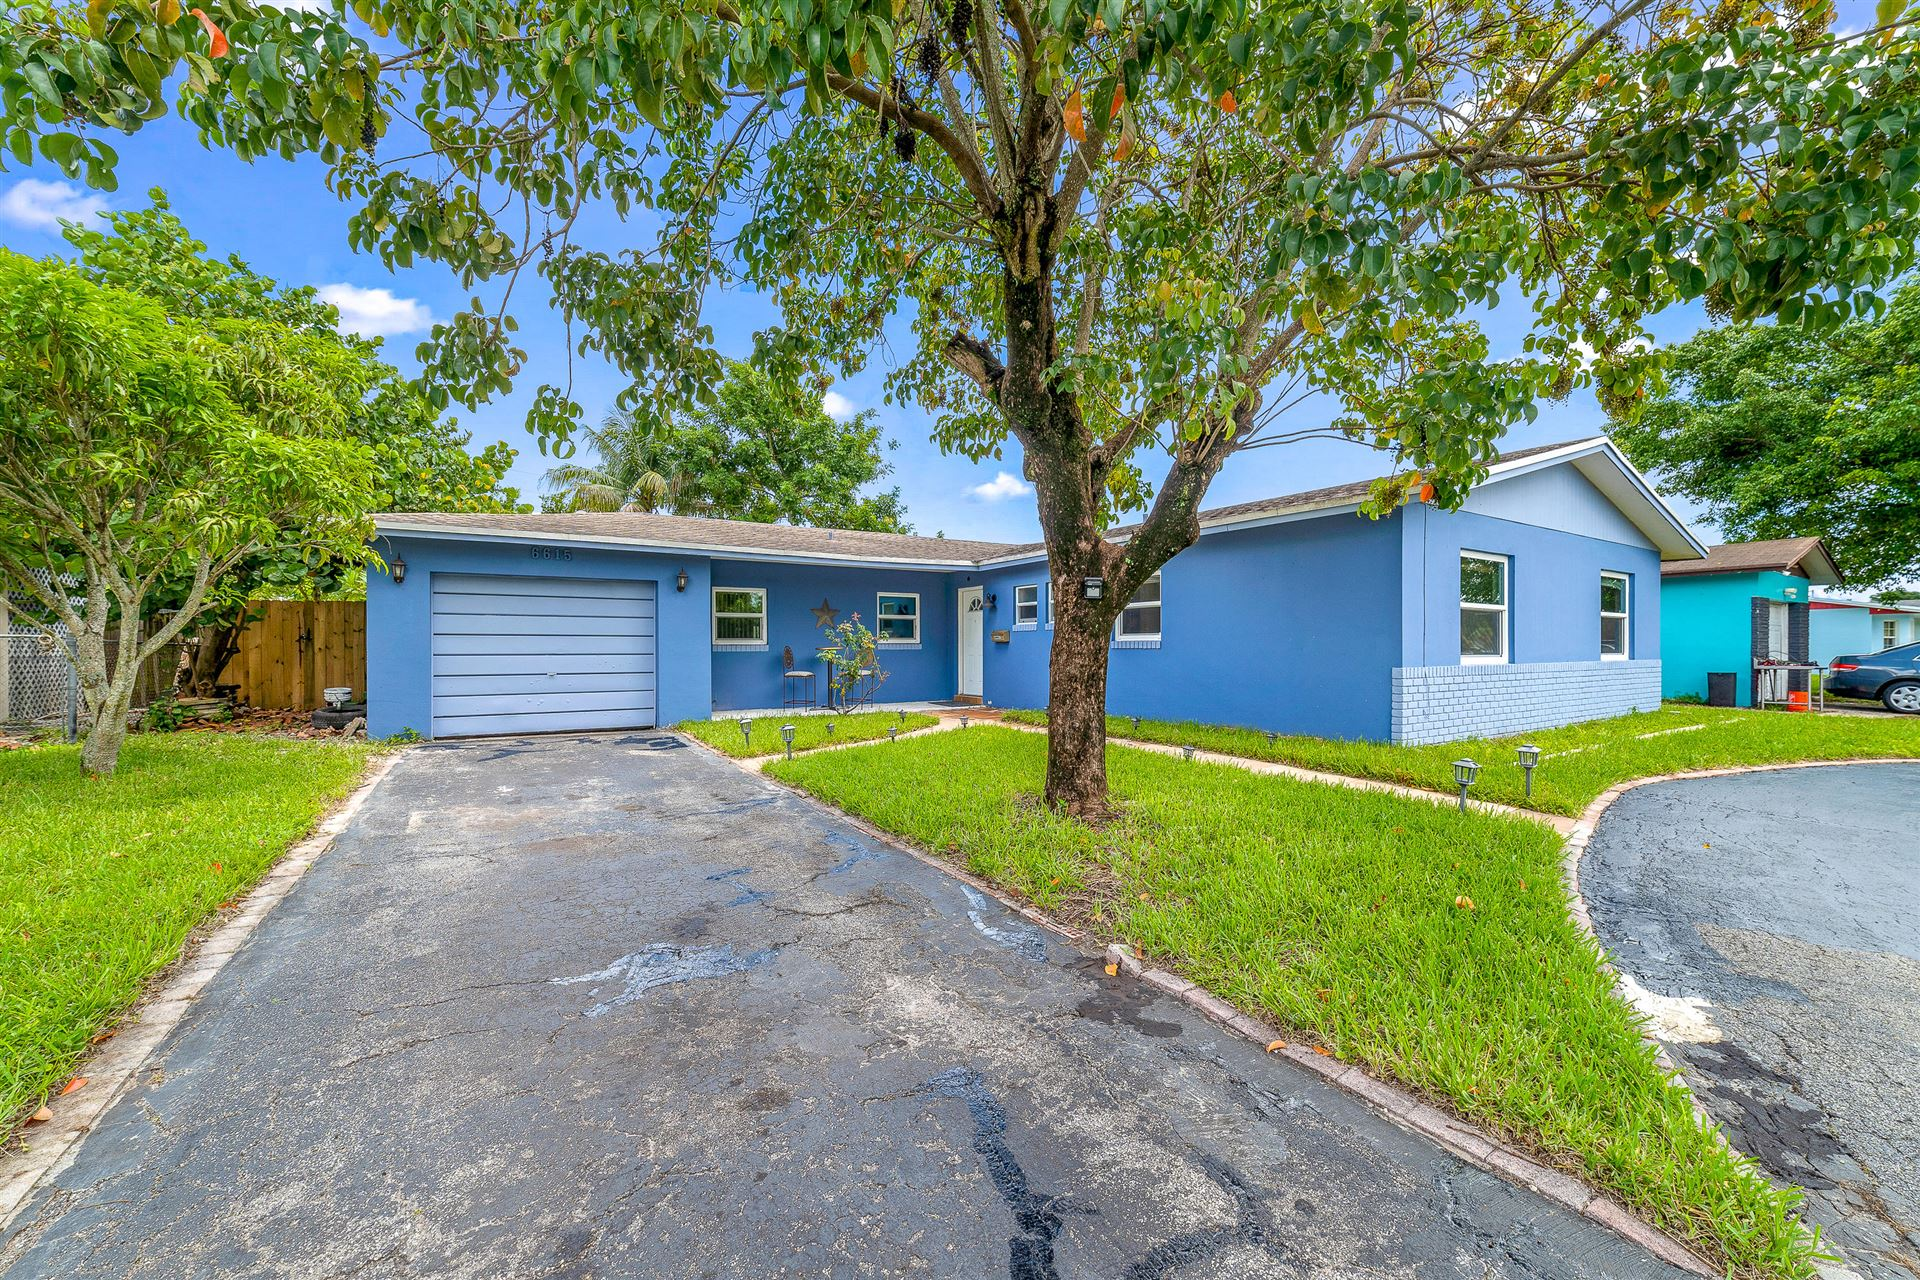 6615 Pebble Beach, North Lauderdale, FL 33068 - MLS#: RX-10731600